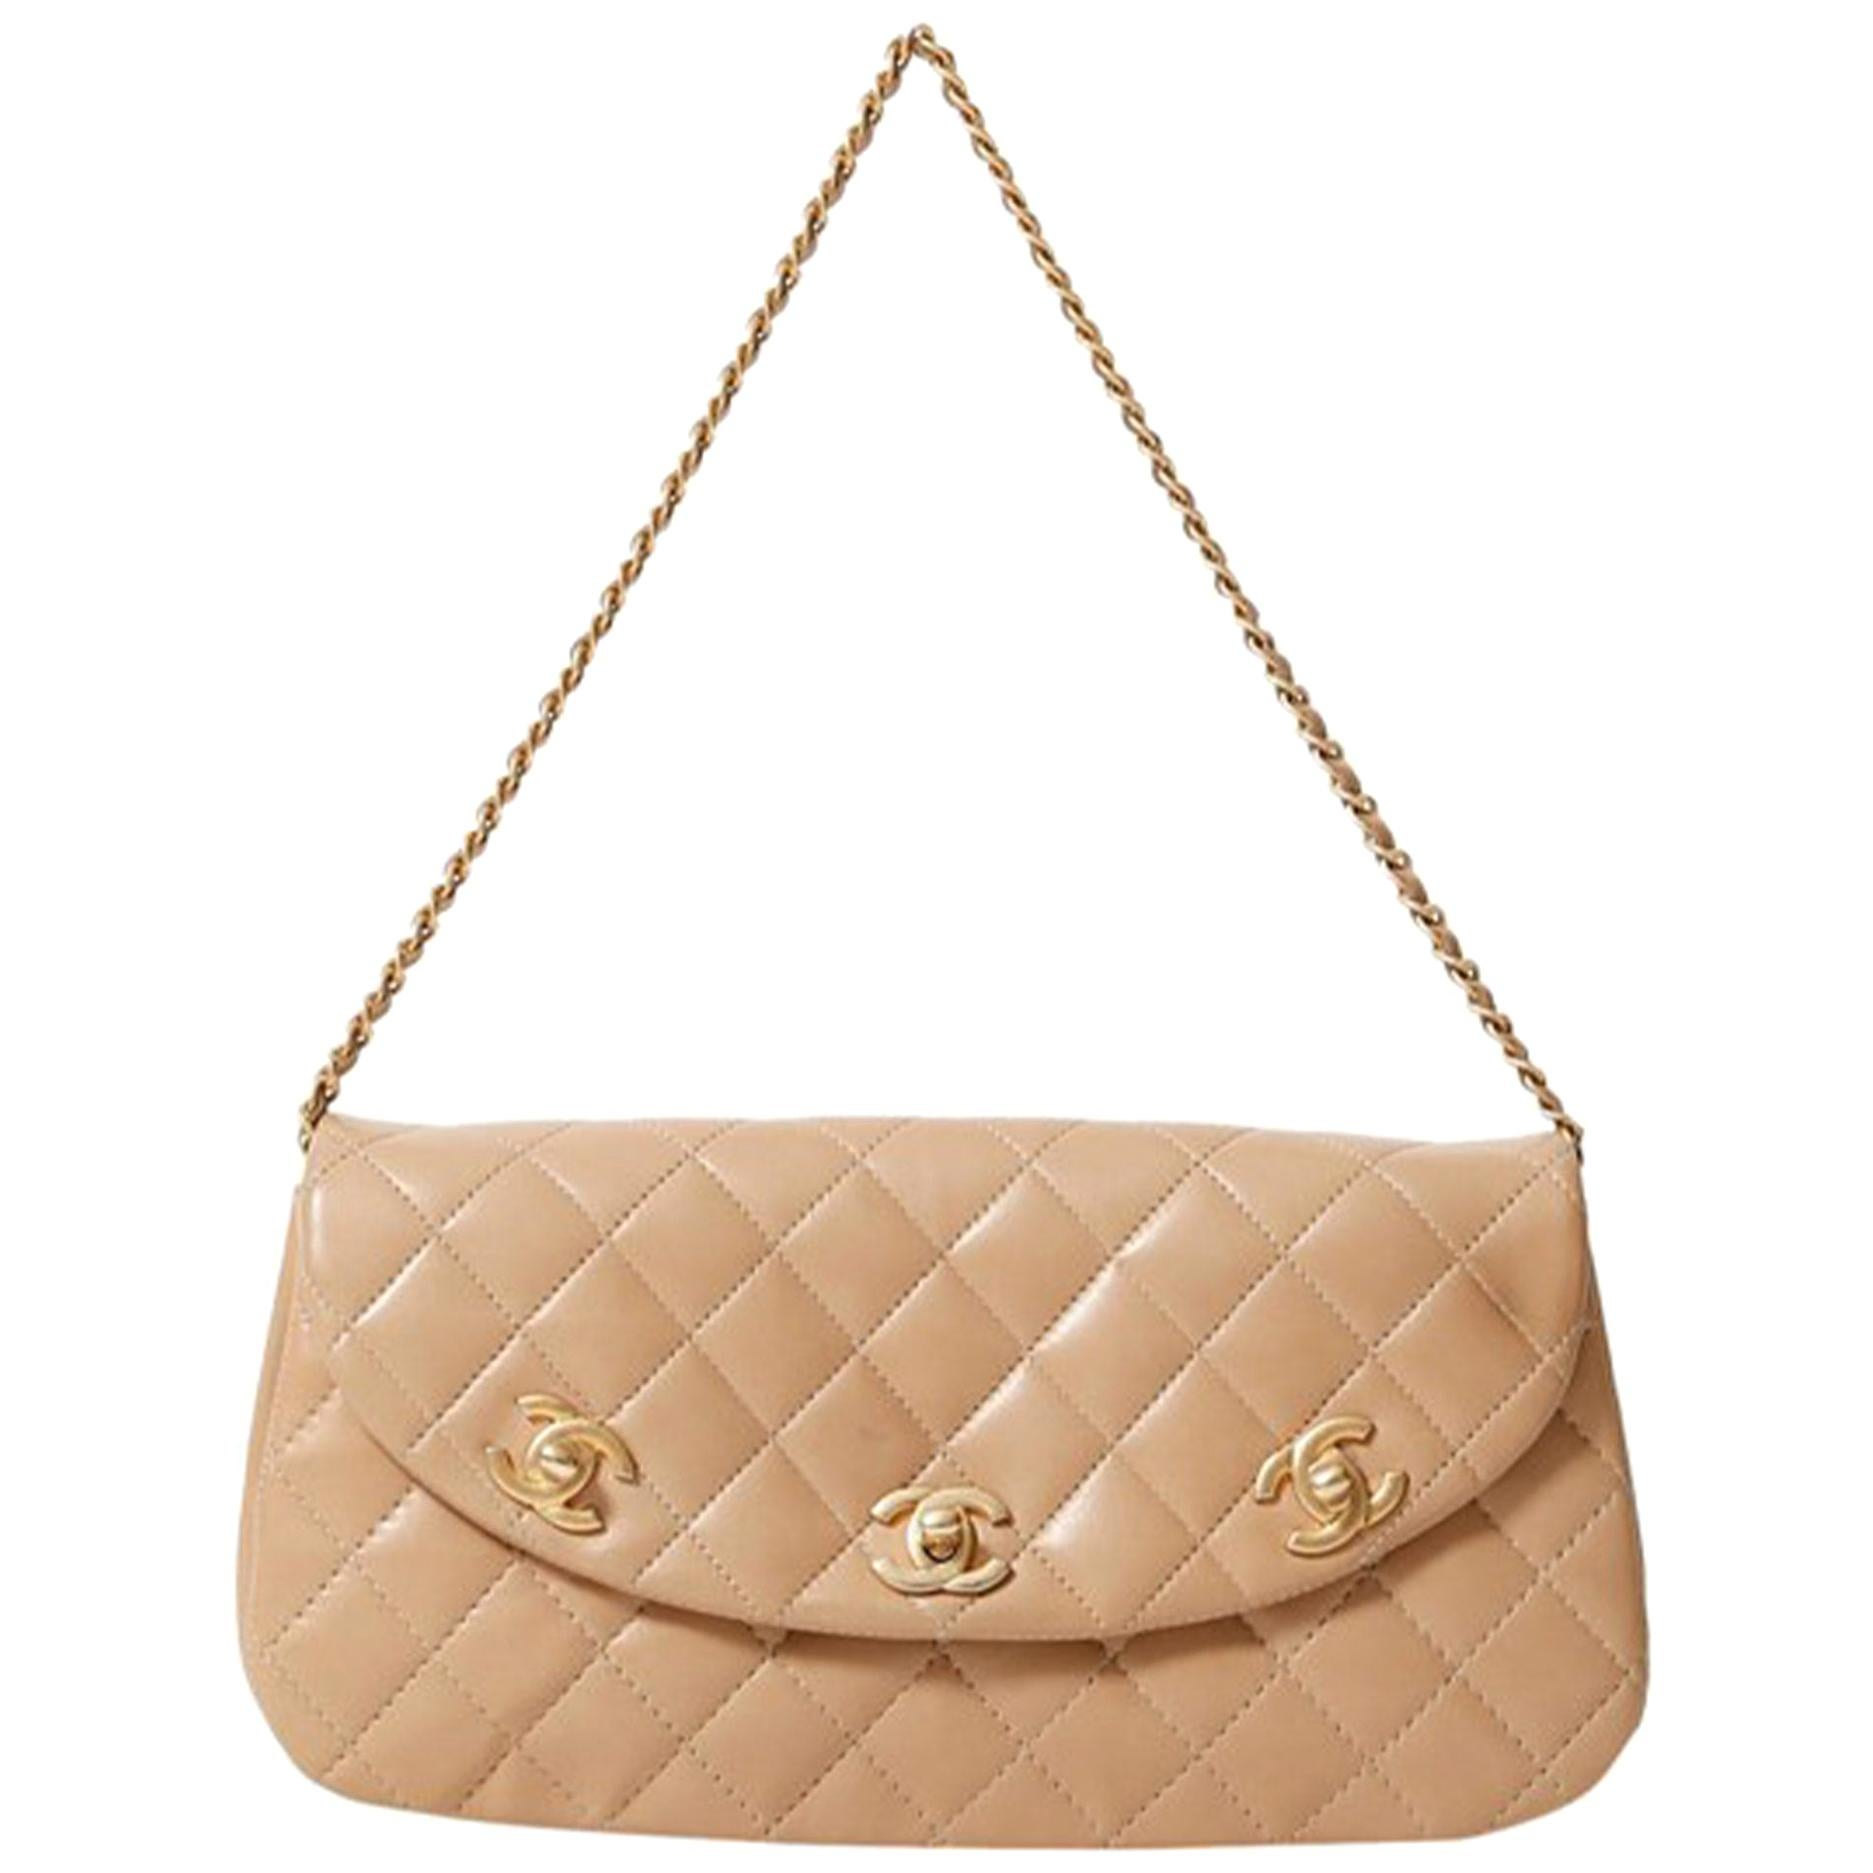 Chanel Bag Top Handle Vintage Rare Triple CC Turnlock Convertible Flap Clutch